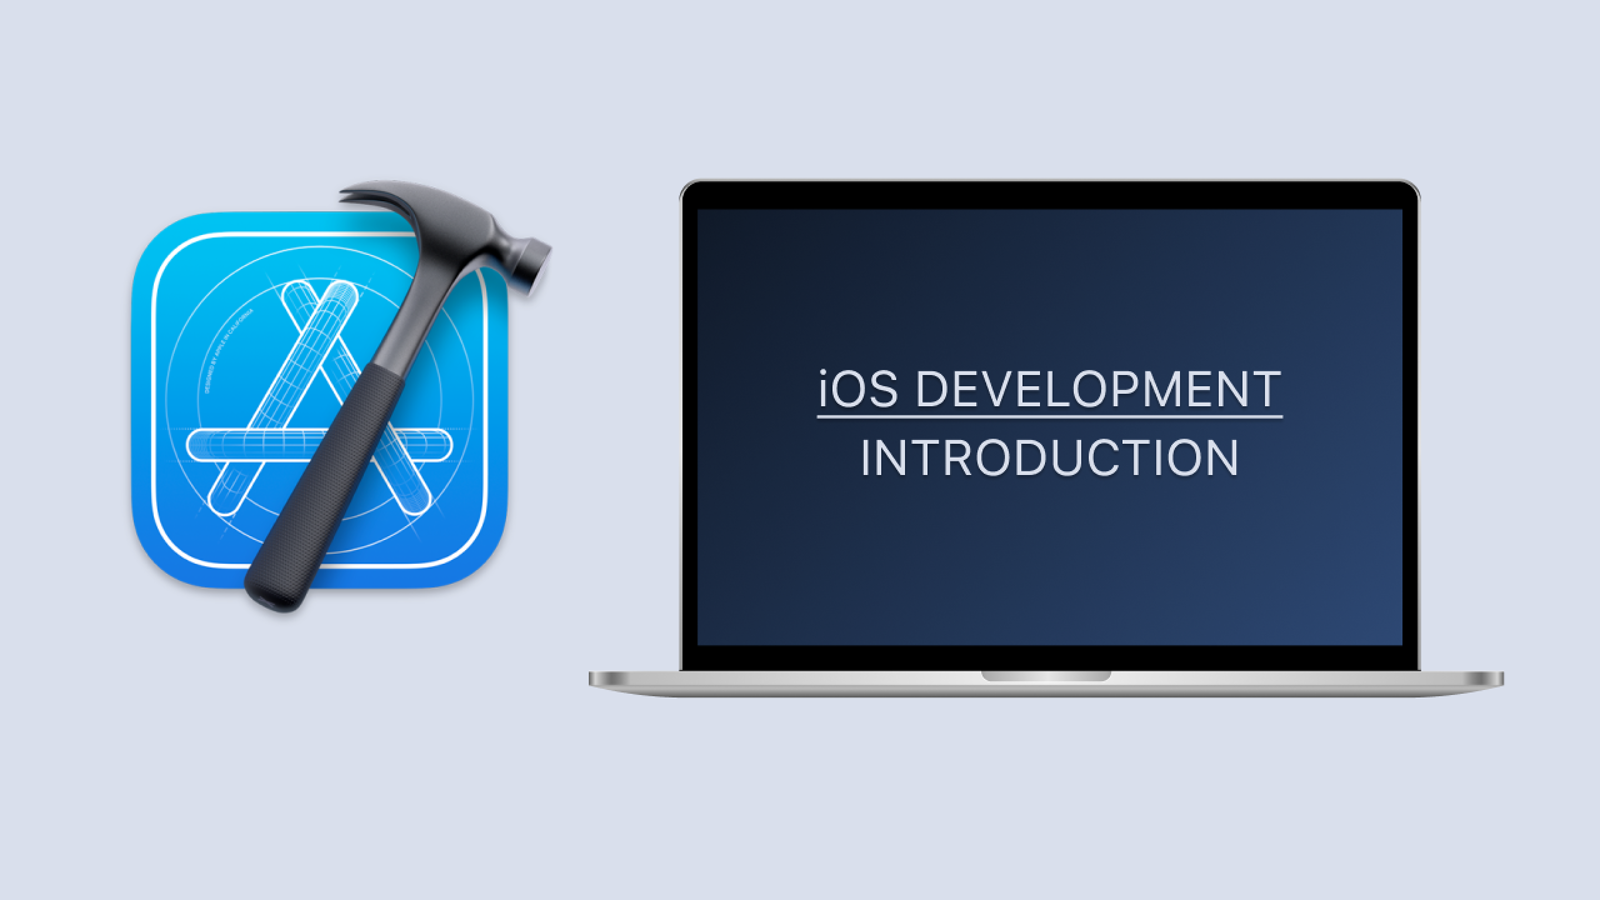 iOS Development #1: Introduction